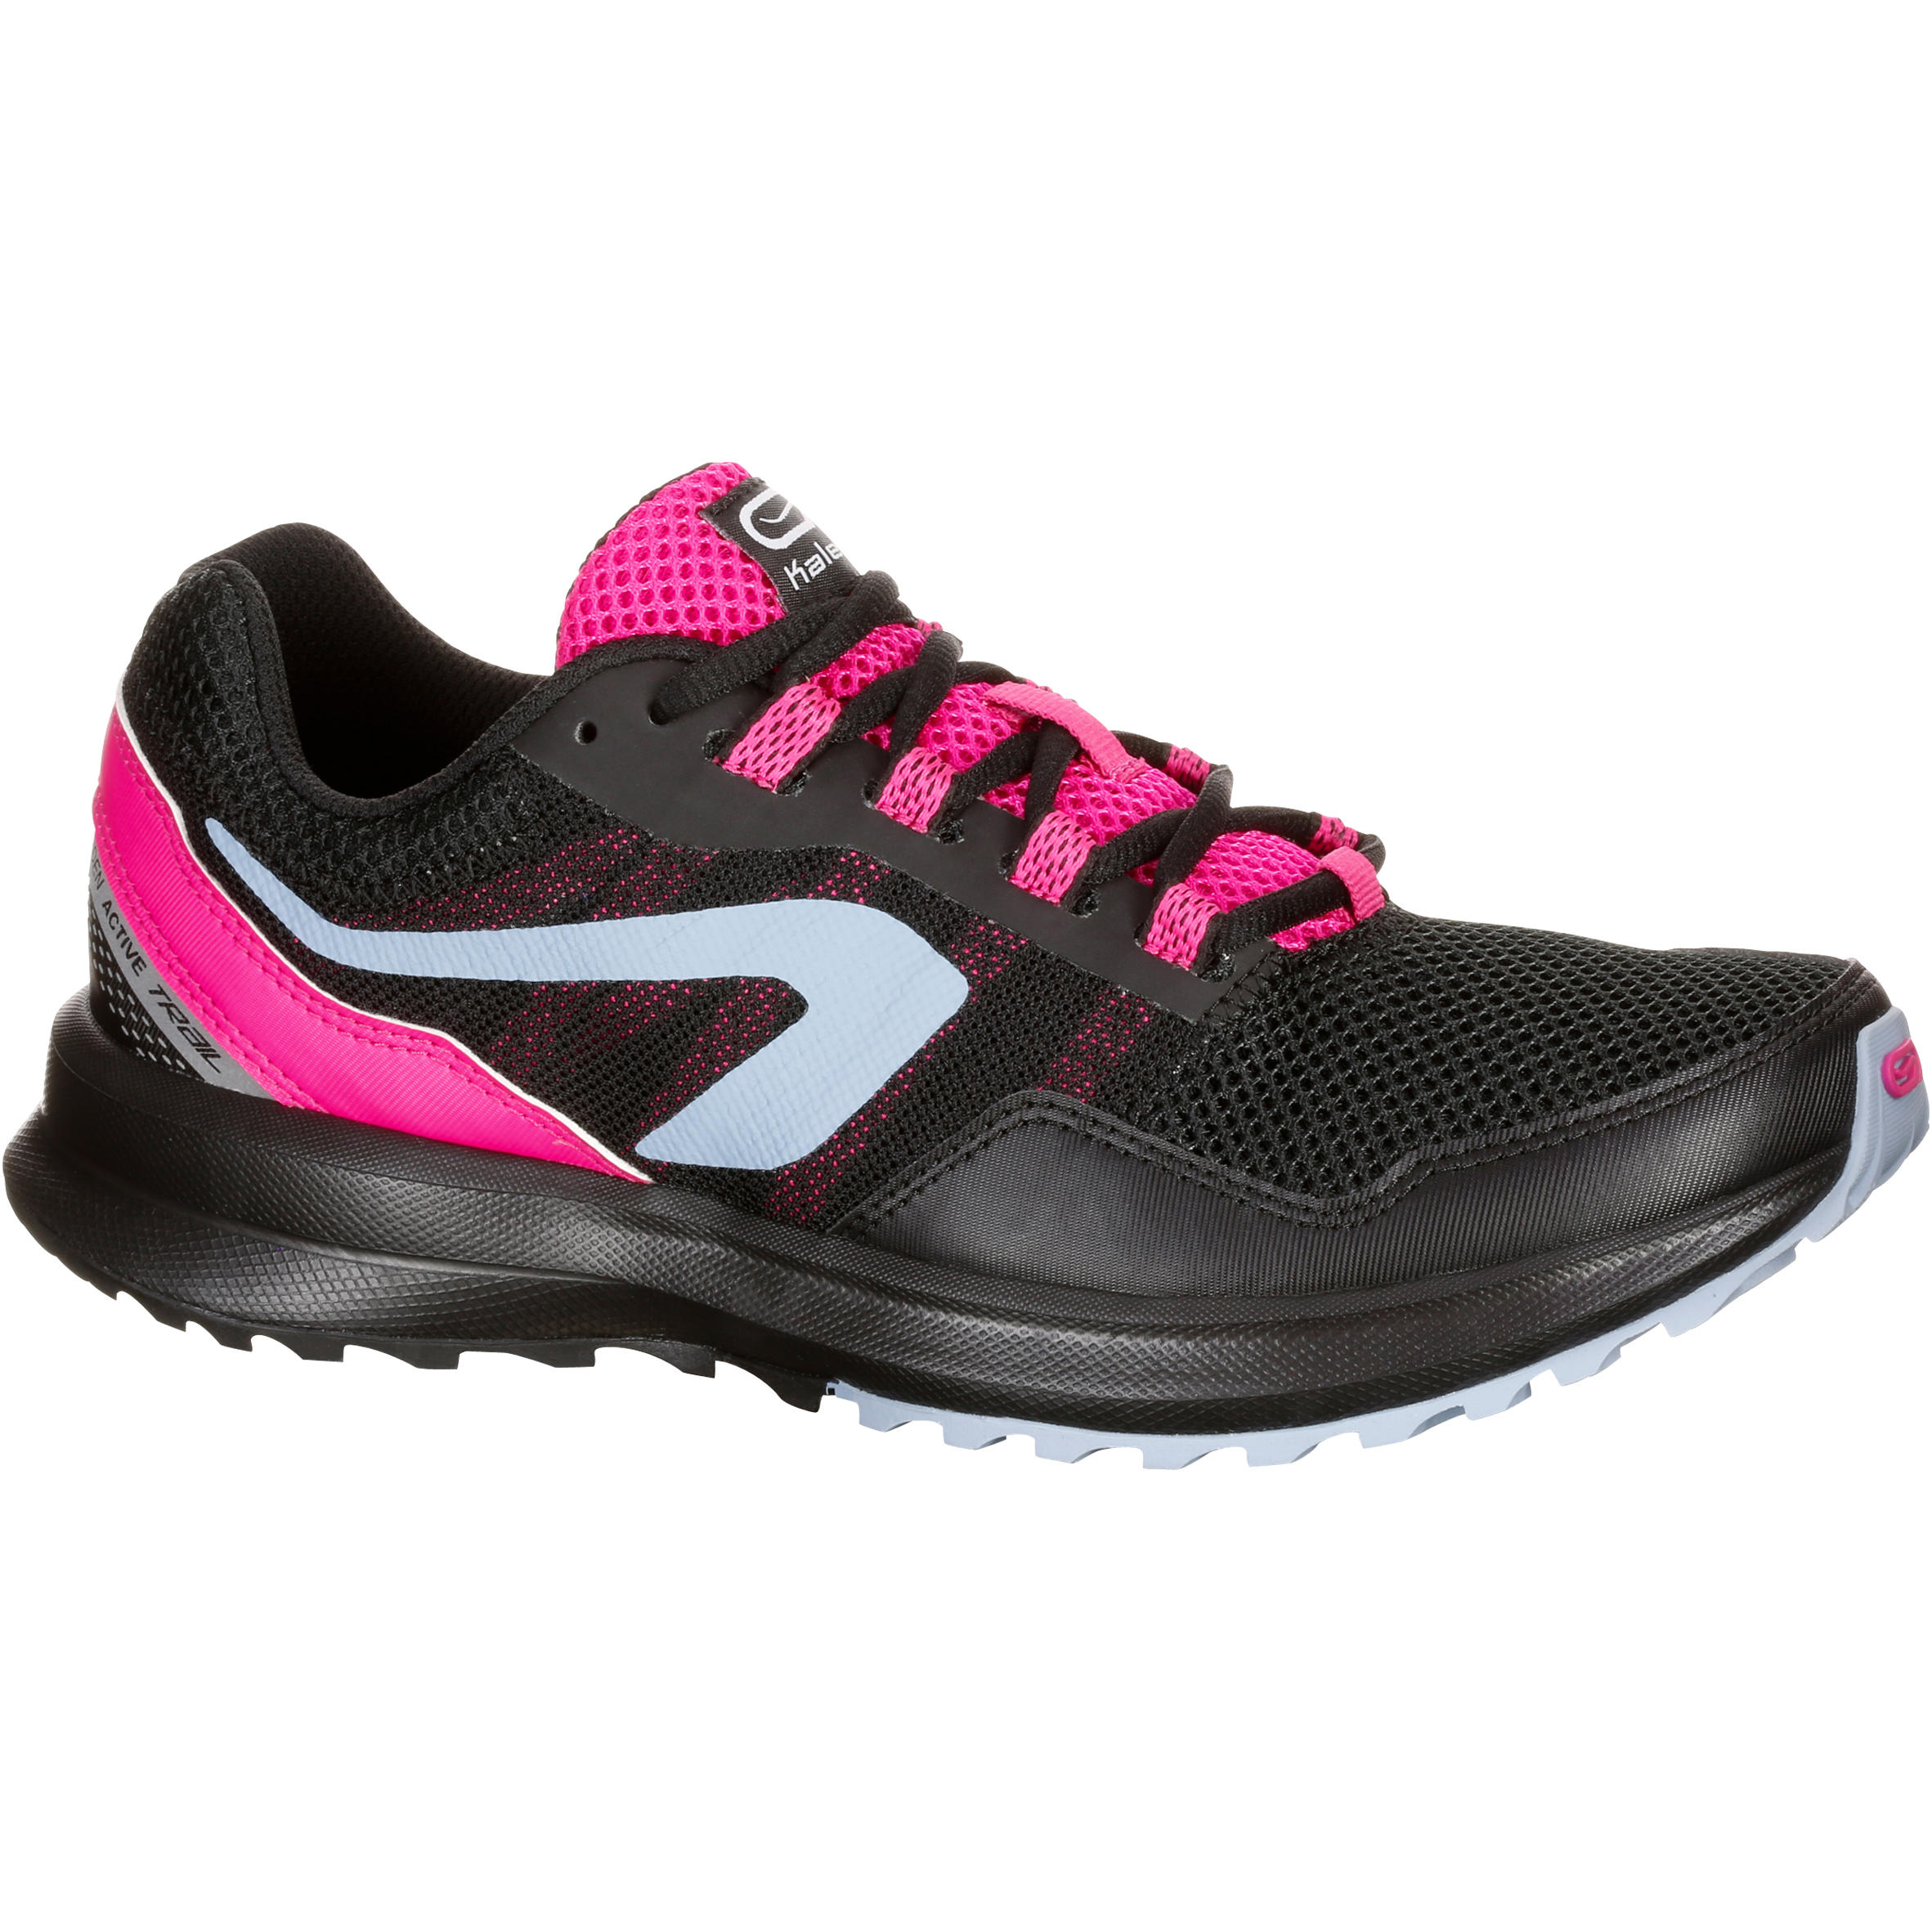 Run Active Grip Women's Jogging Shoes - Black Pink